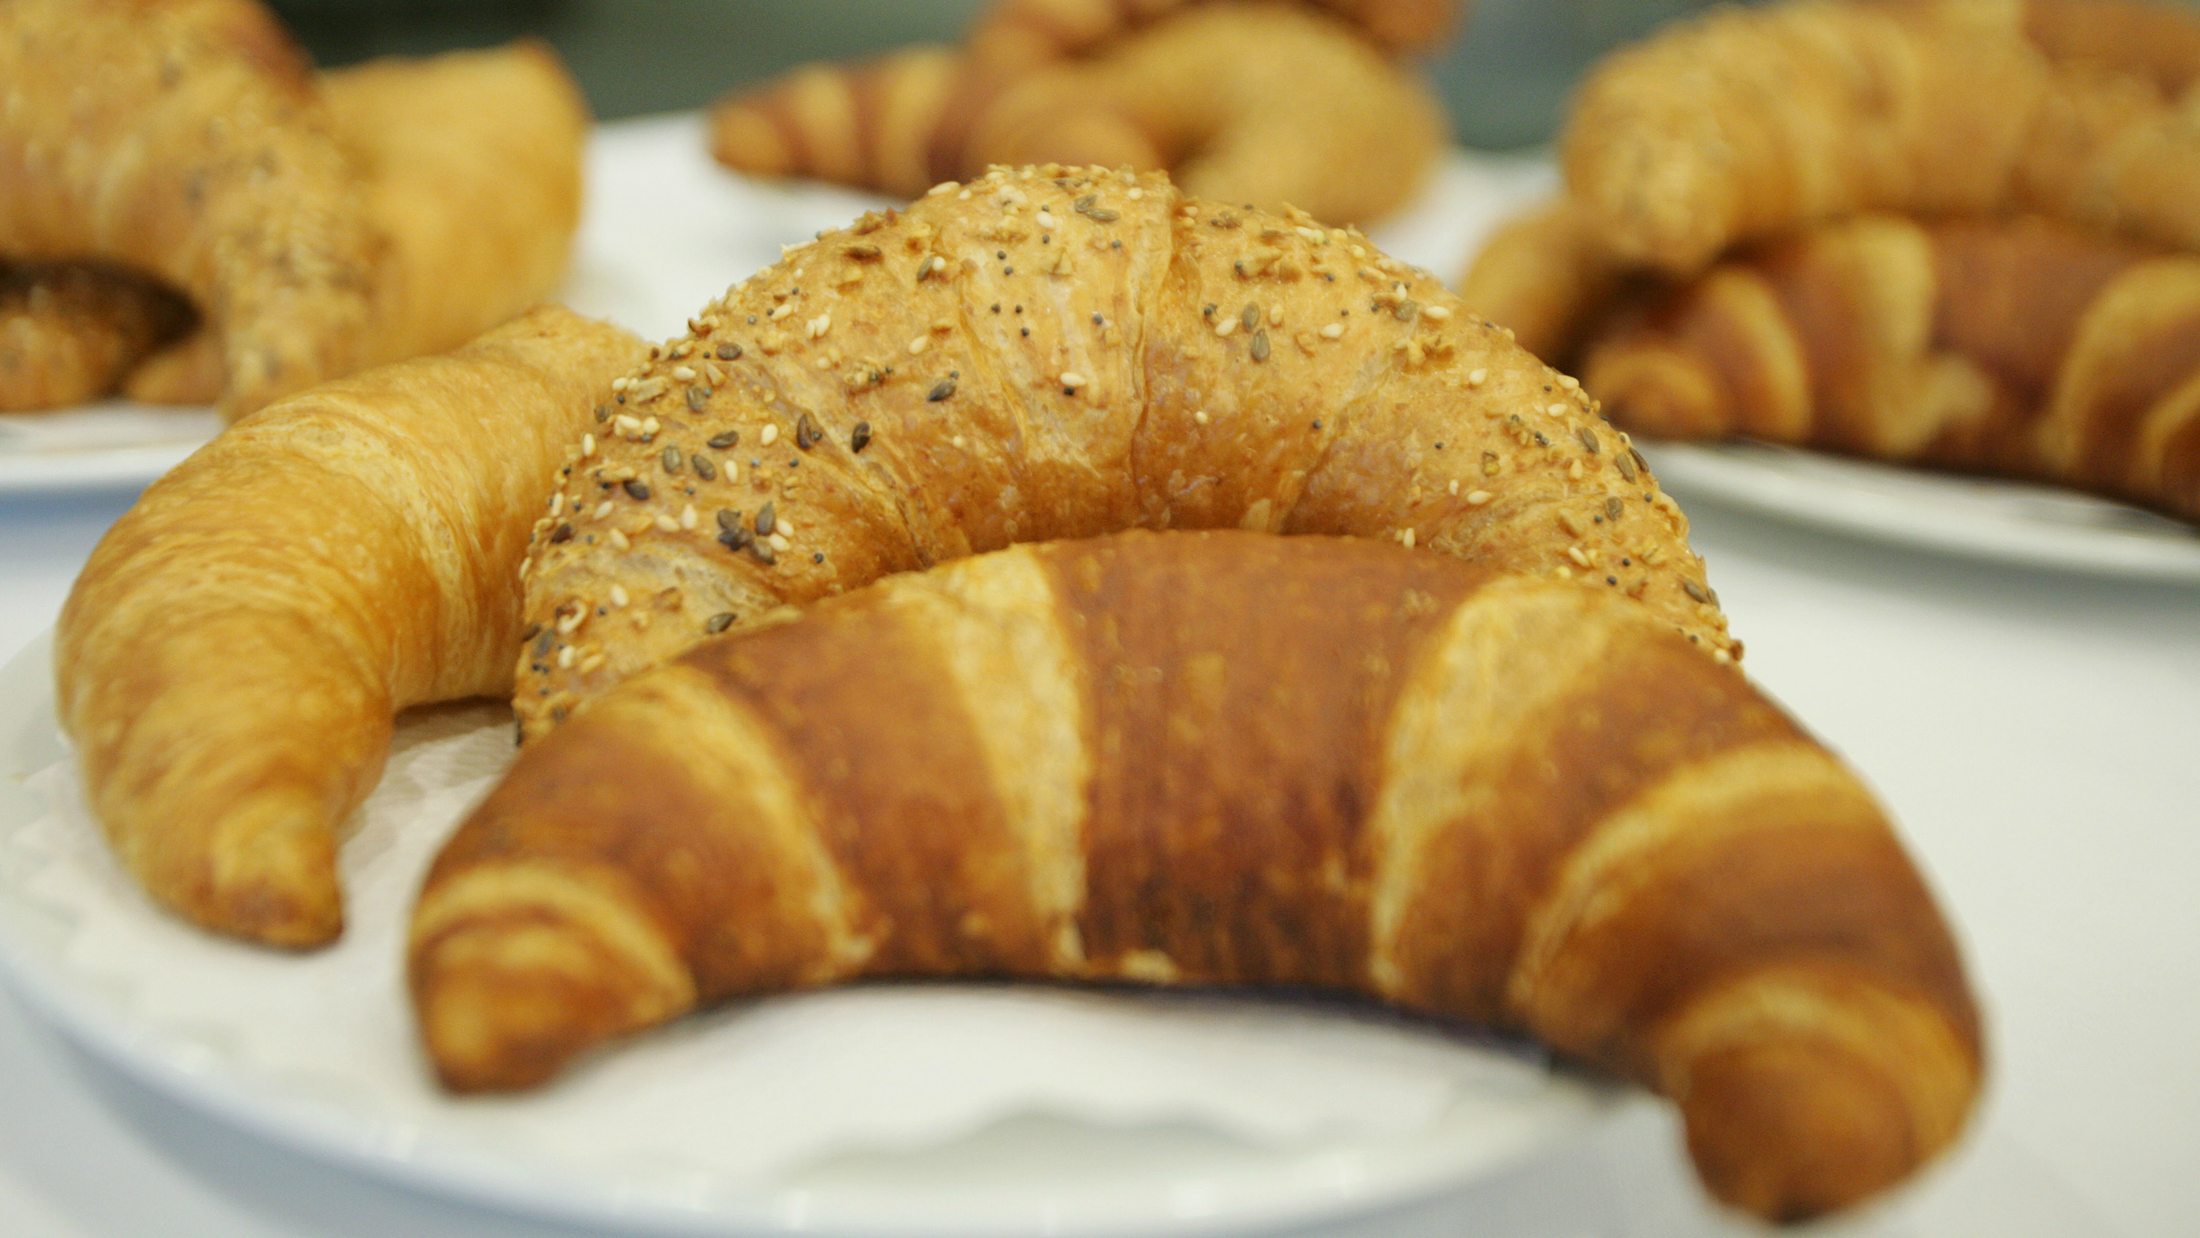 c-croissant-RTR1I6JS-Sebastian Derungs